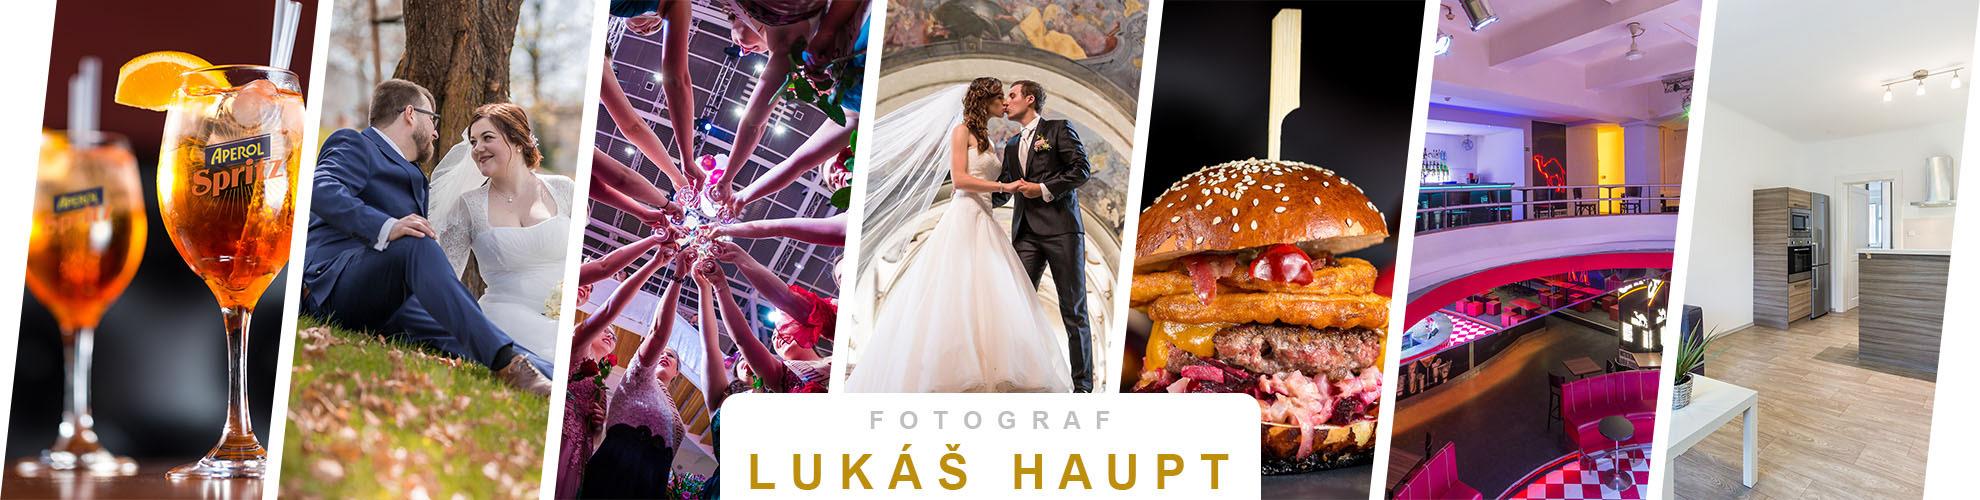 Lukáš Haupt